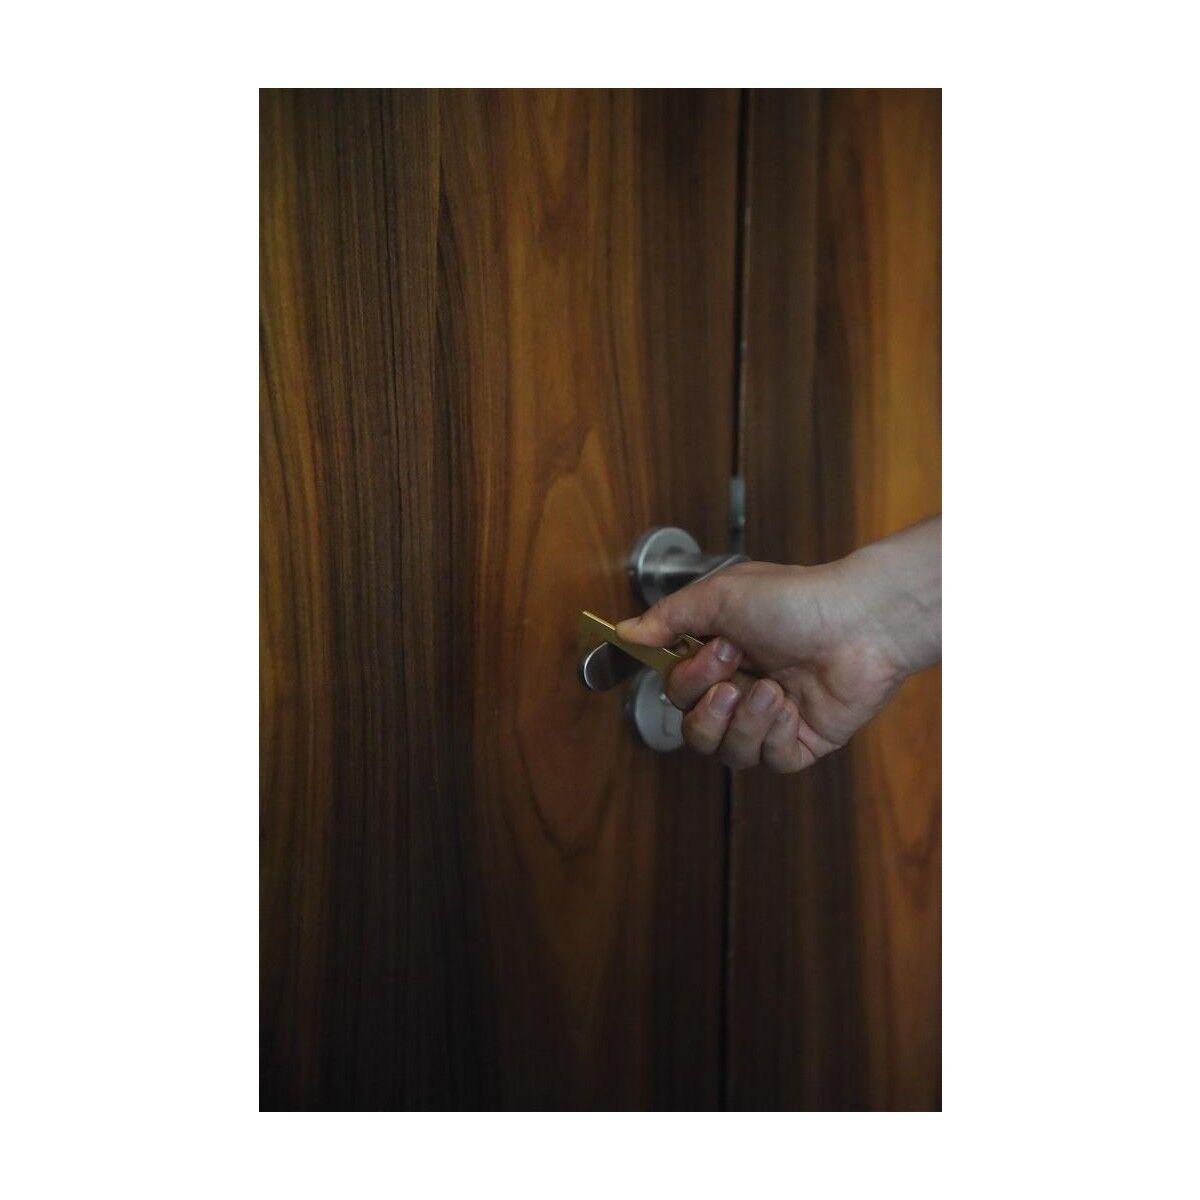 zero contact keychain used on door knobs